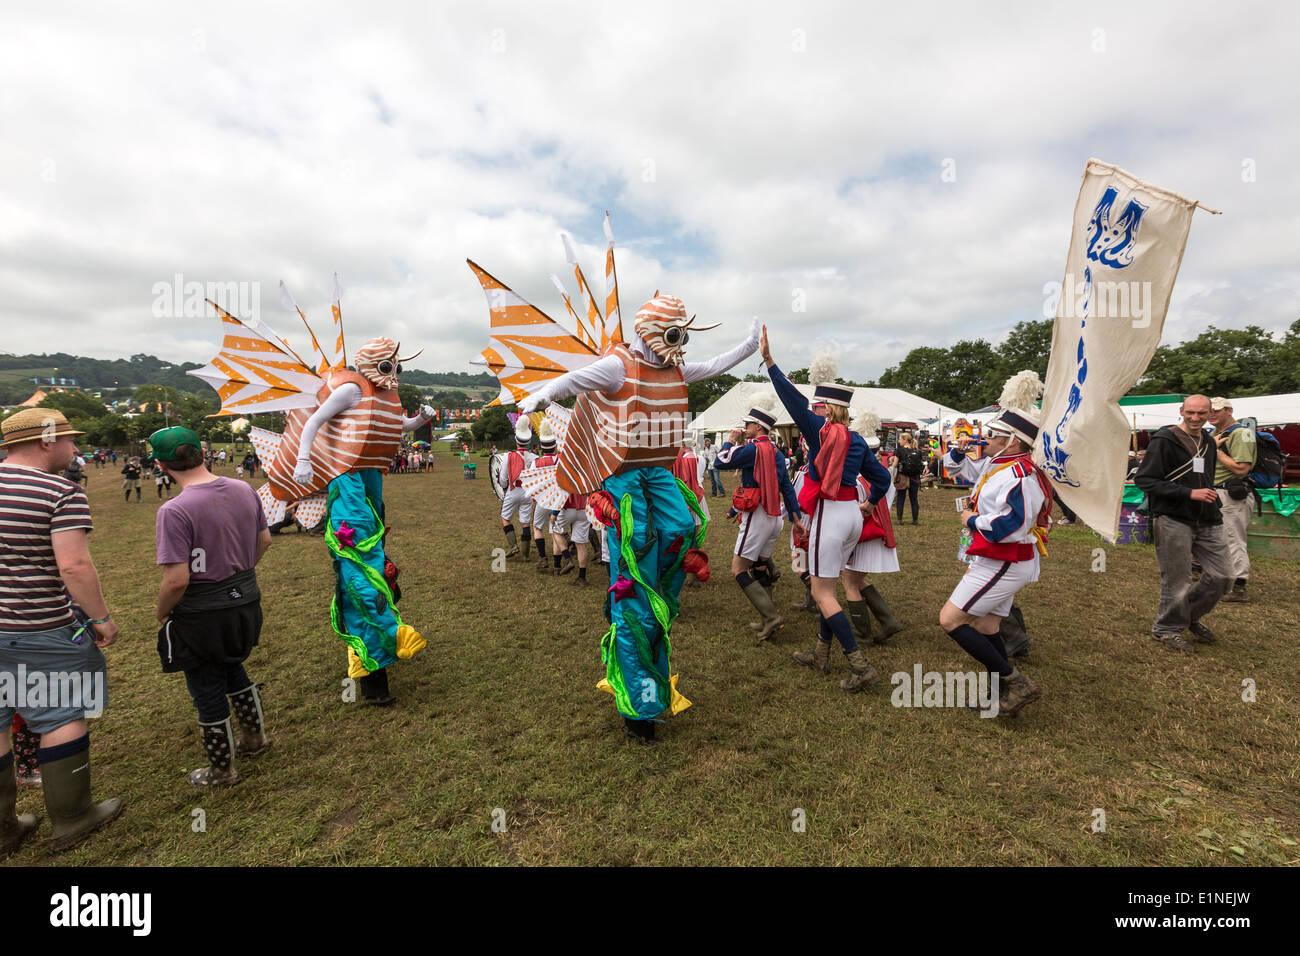 Parade of costumed people Glastonbury Festival 2013 - Stock Image